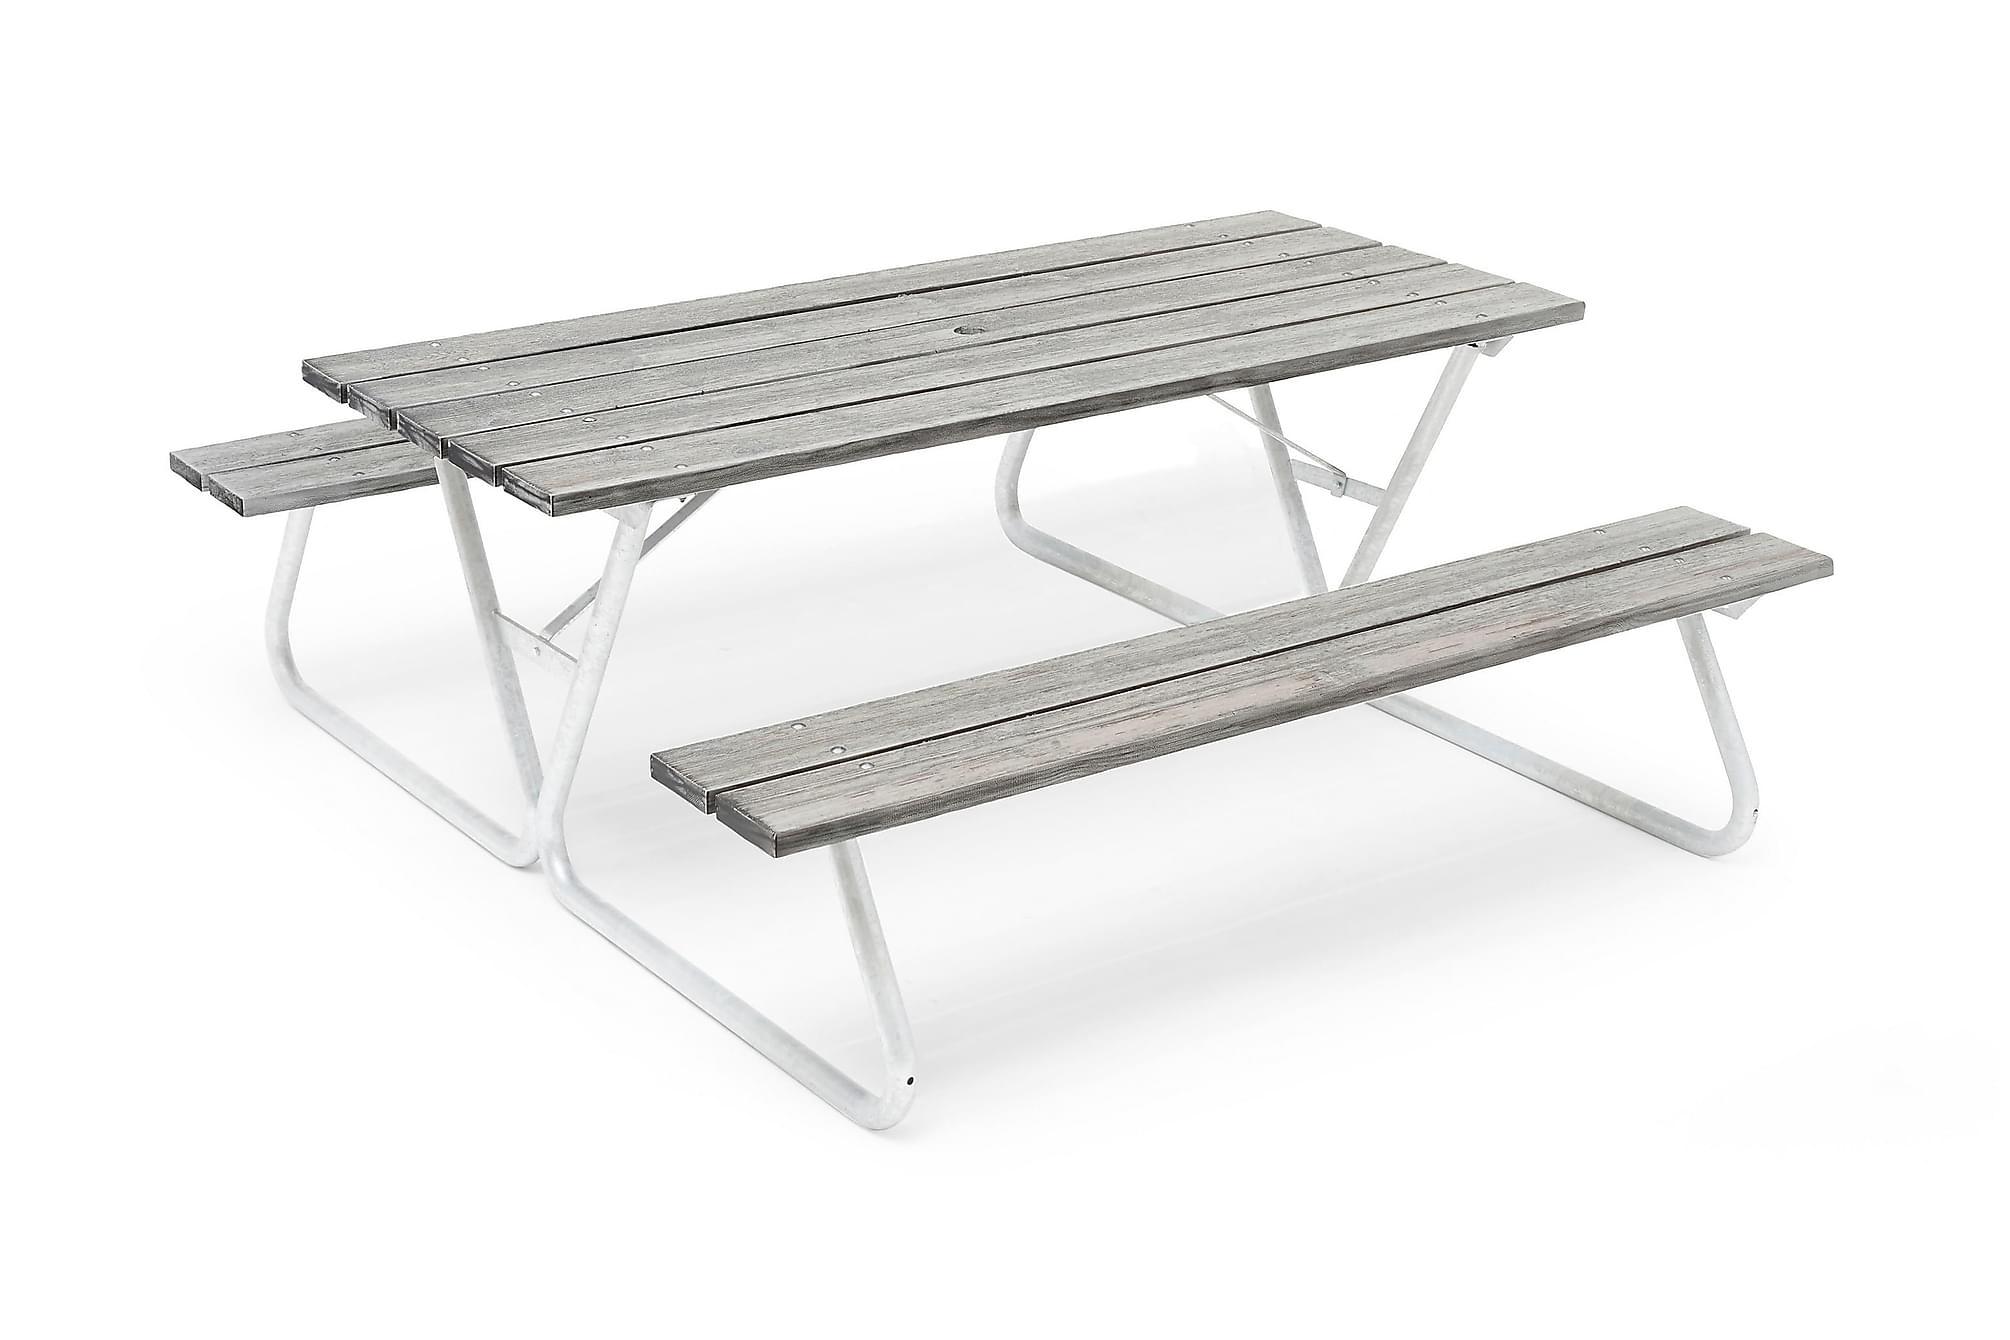 HILLERSTORP PICNIC Picknickbord Bastant Utan Rygg Whitewash, Bänkbord